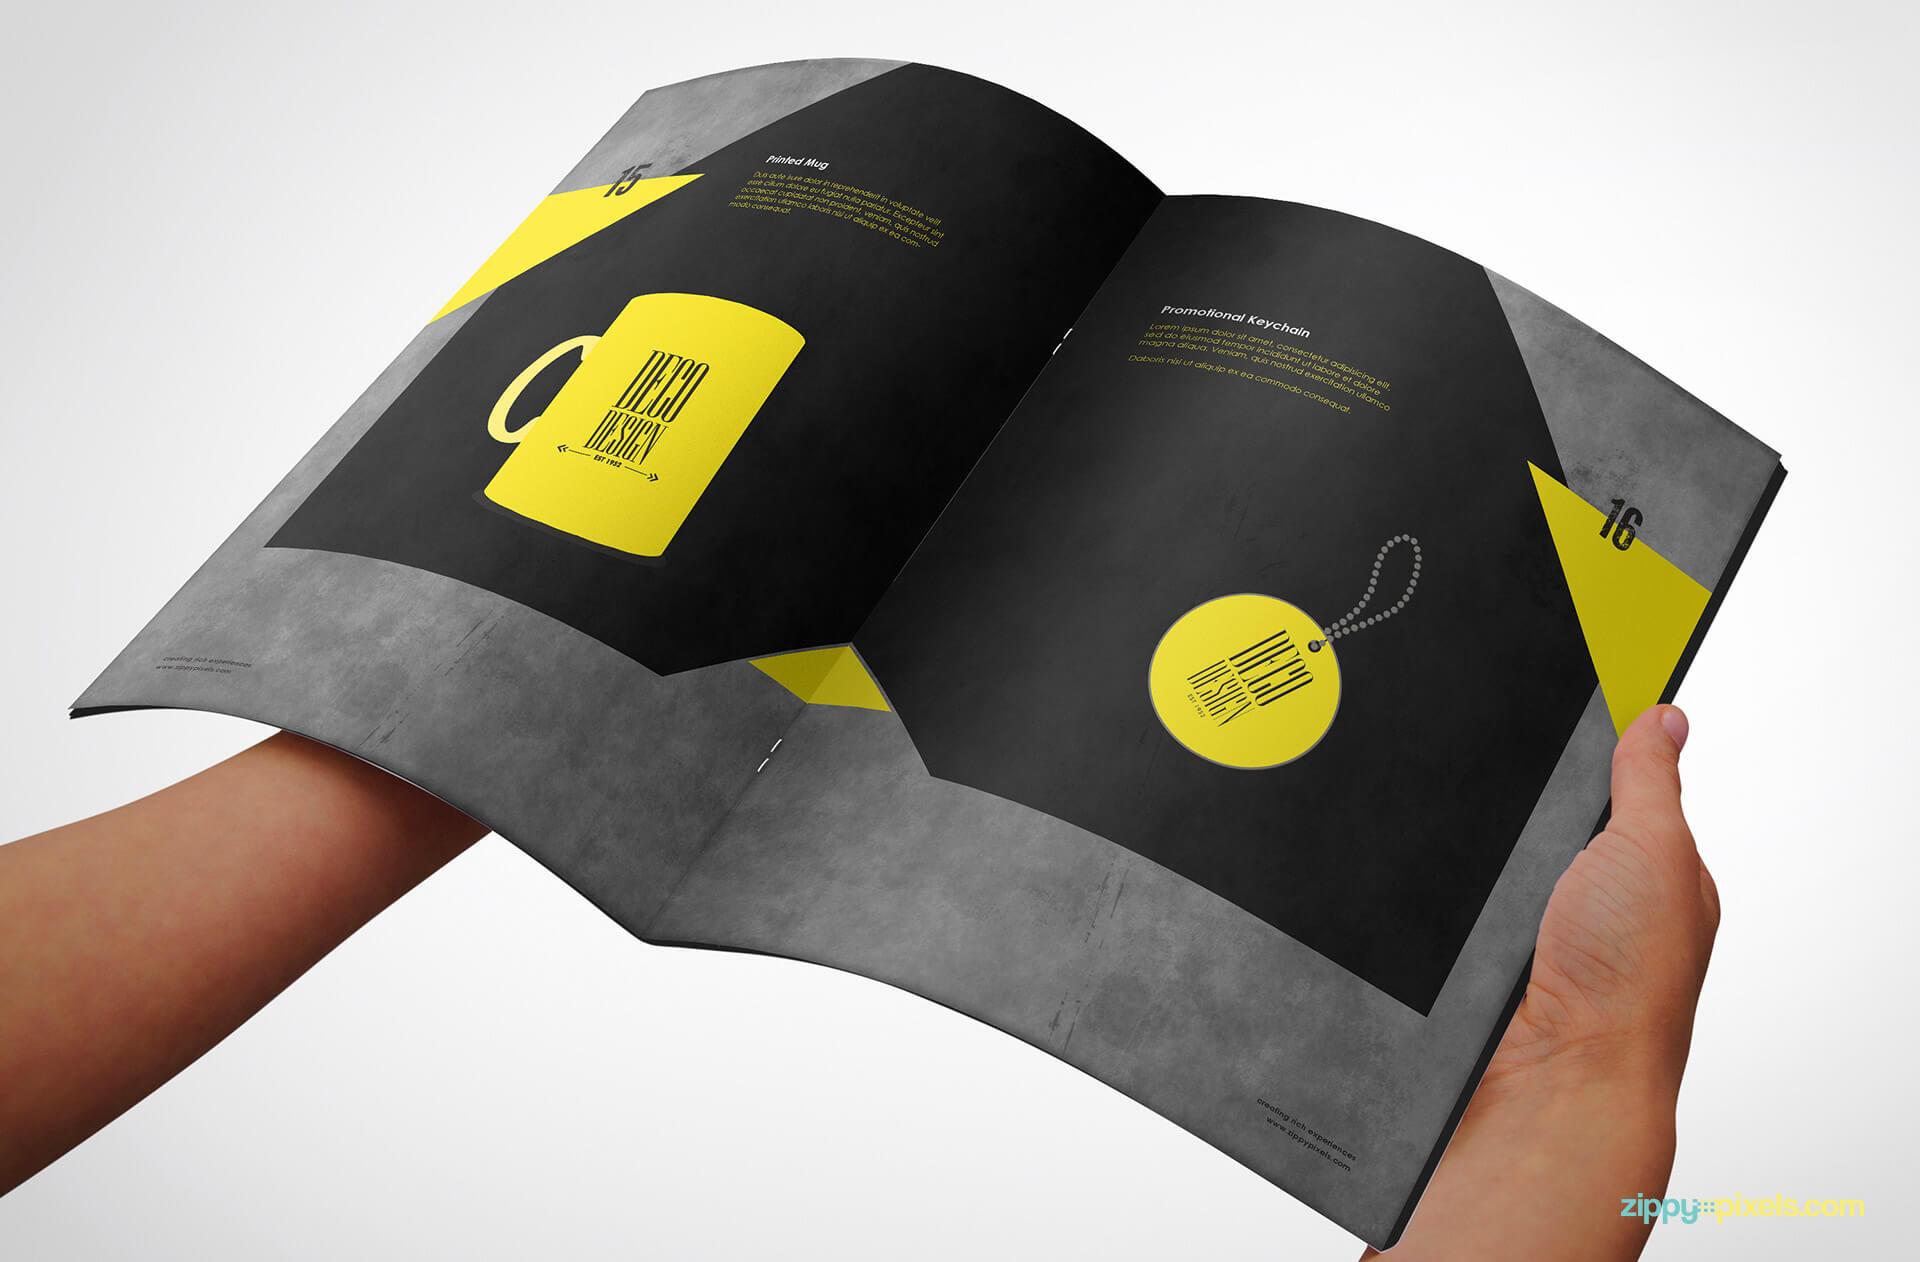 12-brand-book-7-printed-mug-promotional-keychain